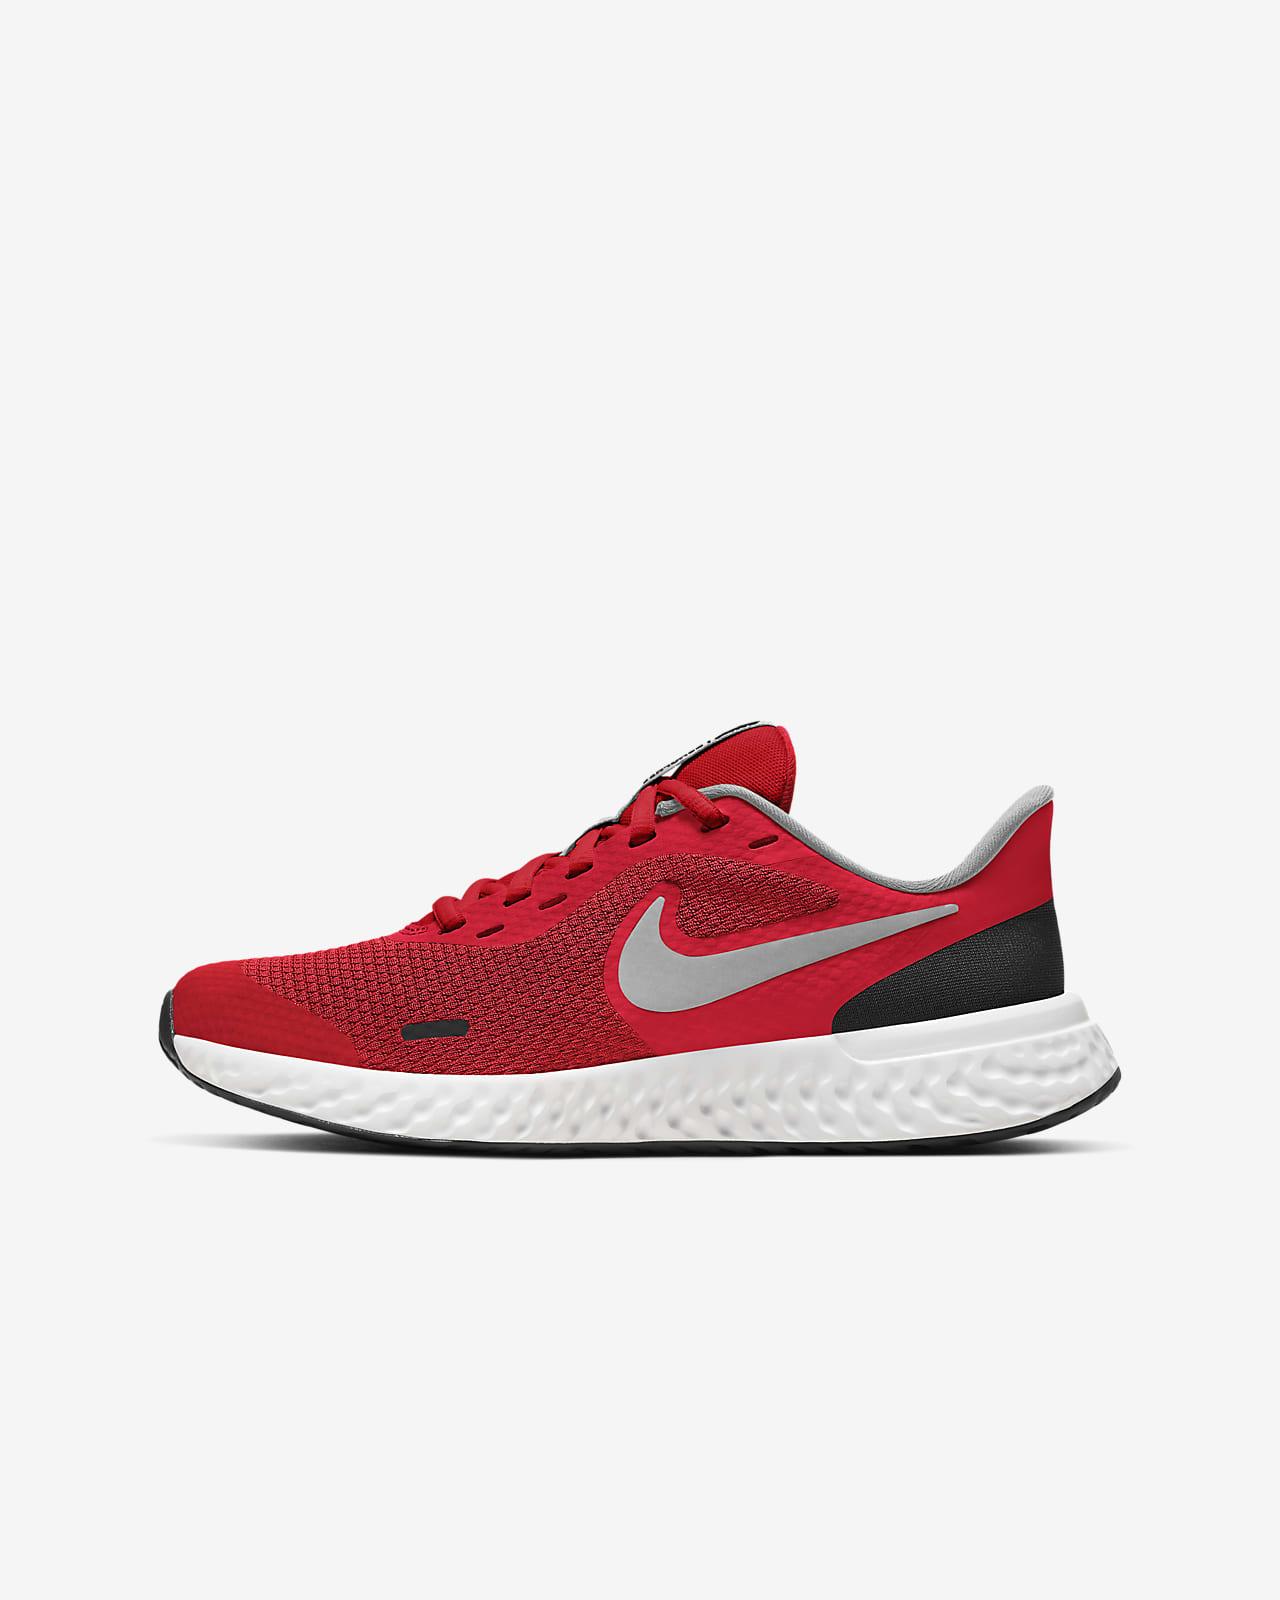 Calzado de running para carretera para niños talla grande Nike Revolution 5